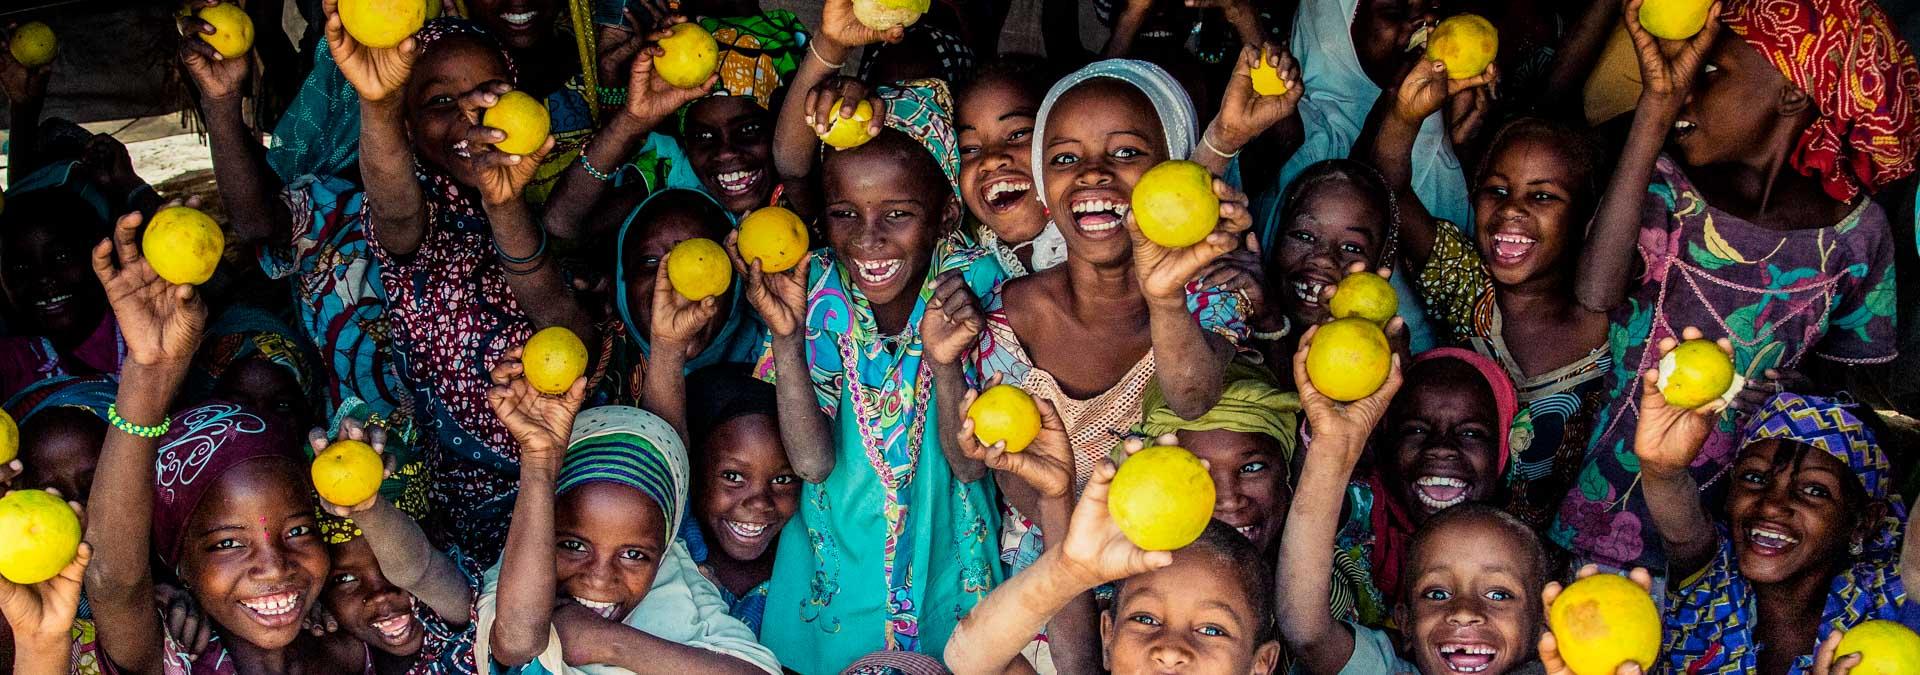 Global Advocate Council - SOS Children's Villages USA